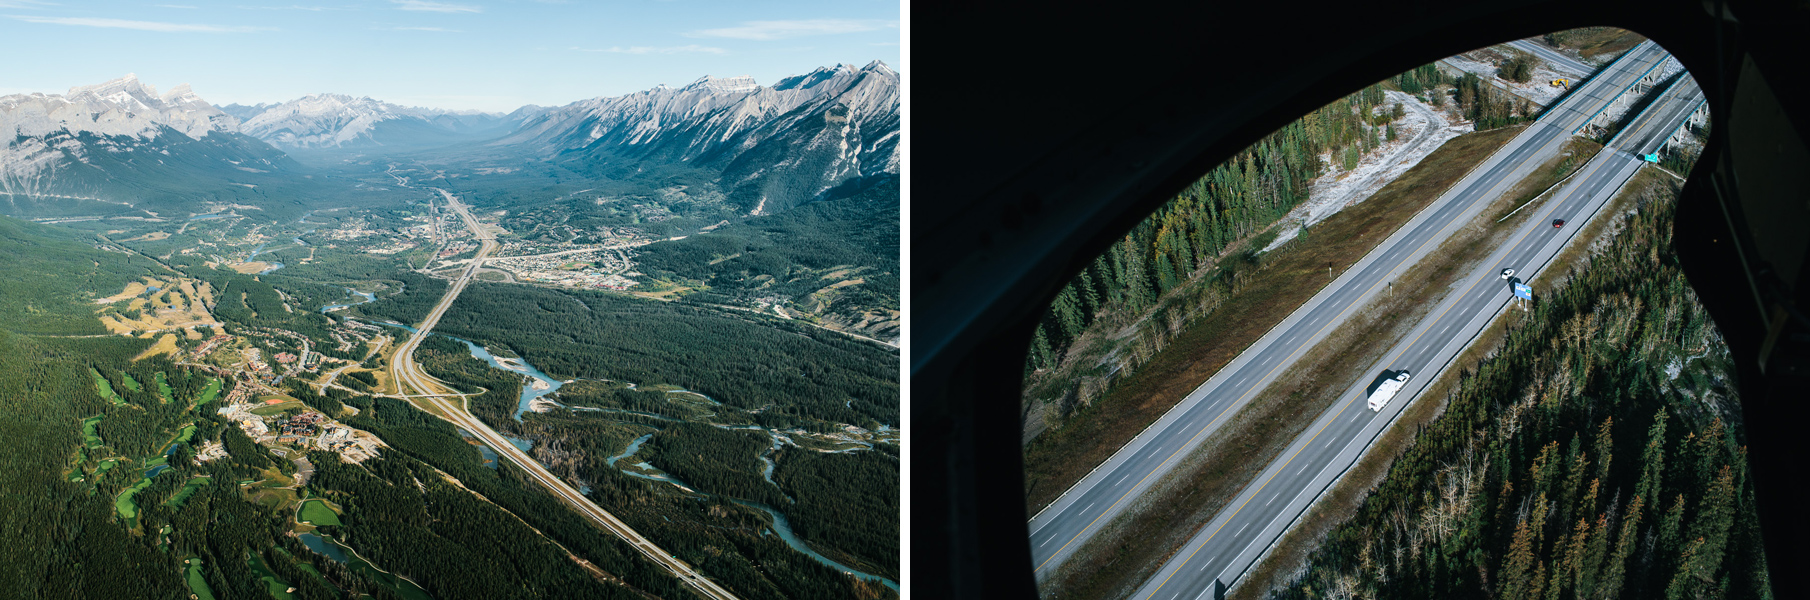 AlbertaCanada-201309-FinnBeales-05.jpg